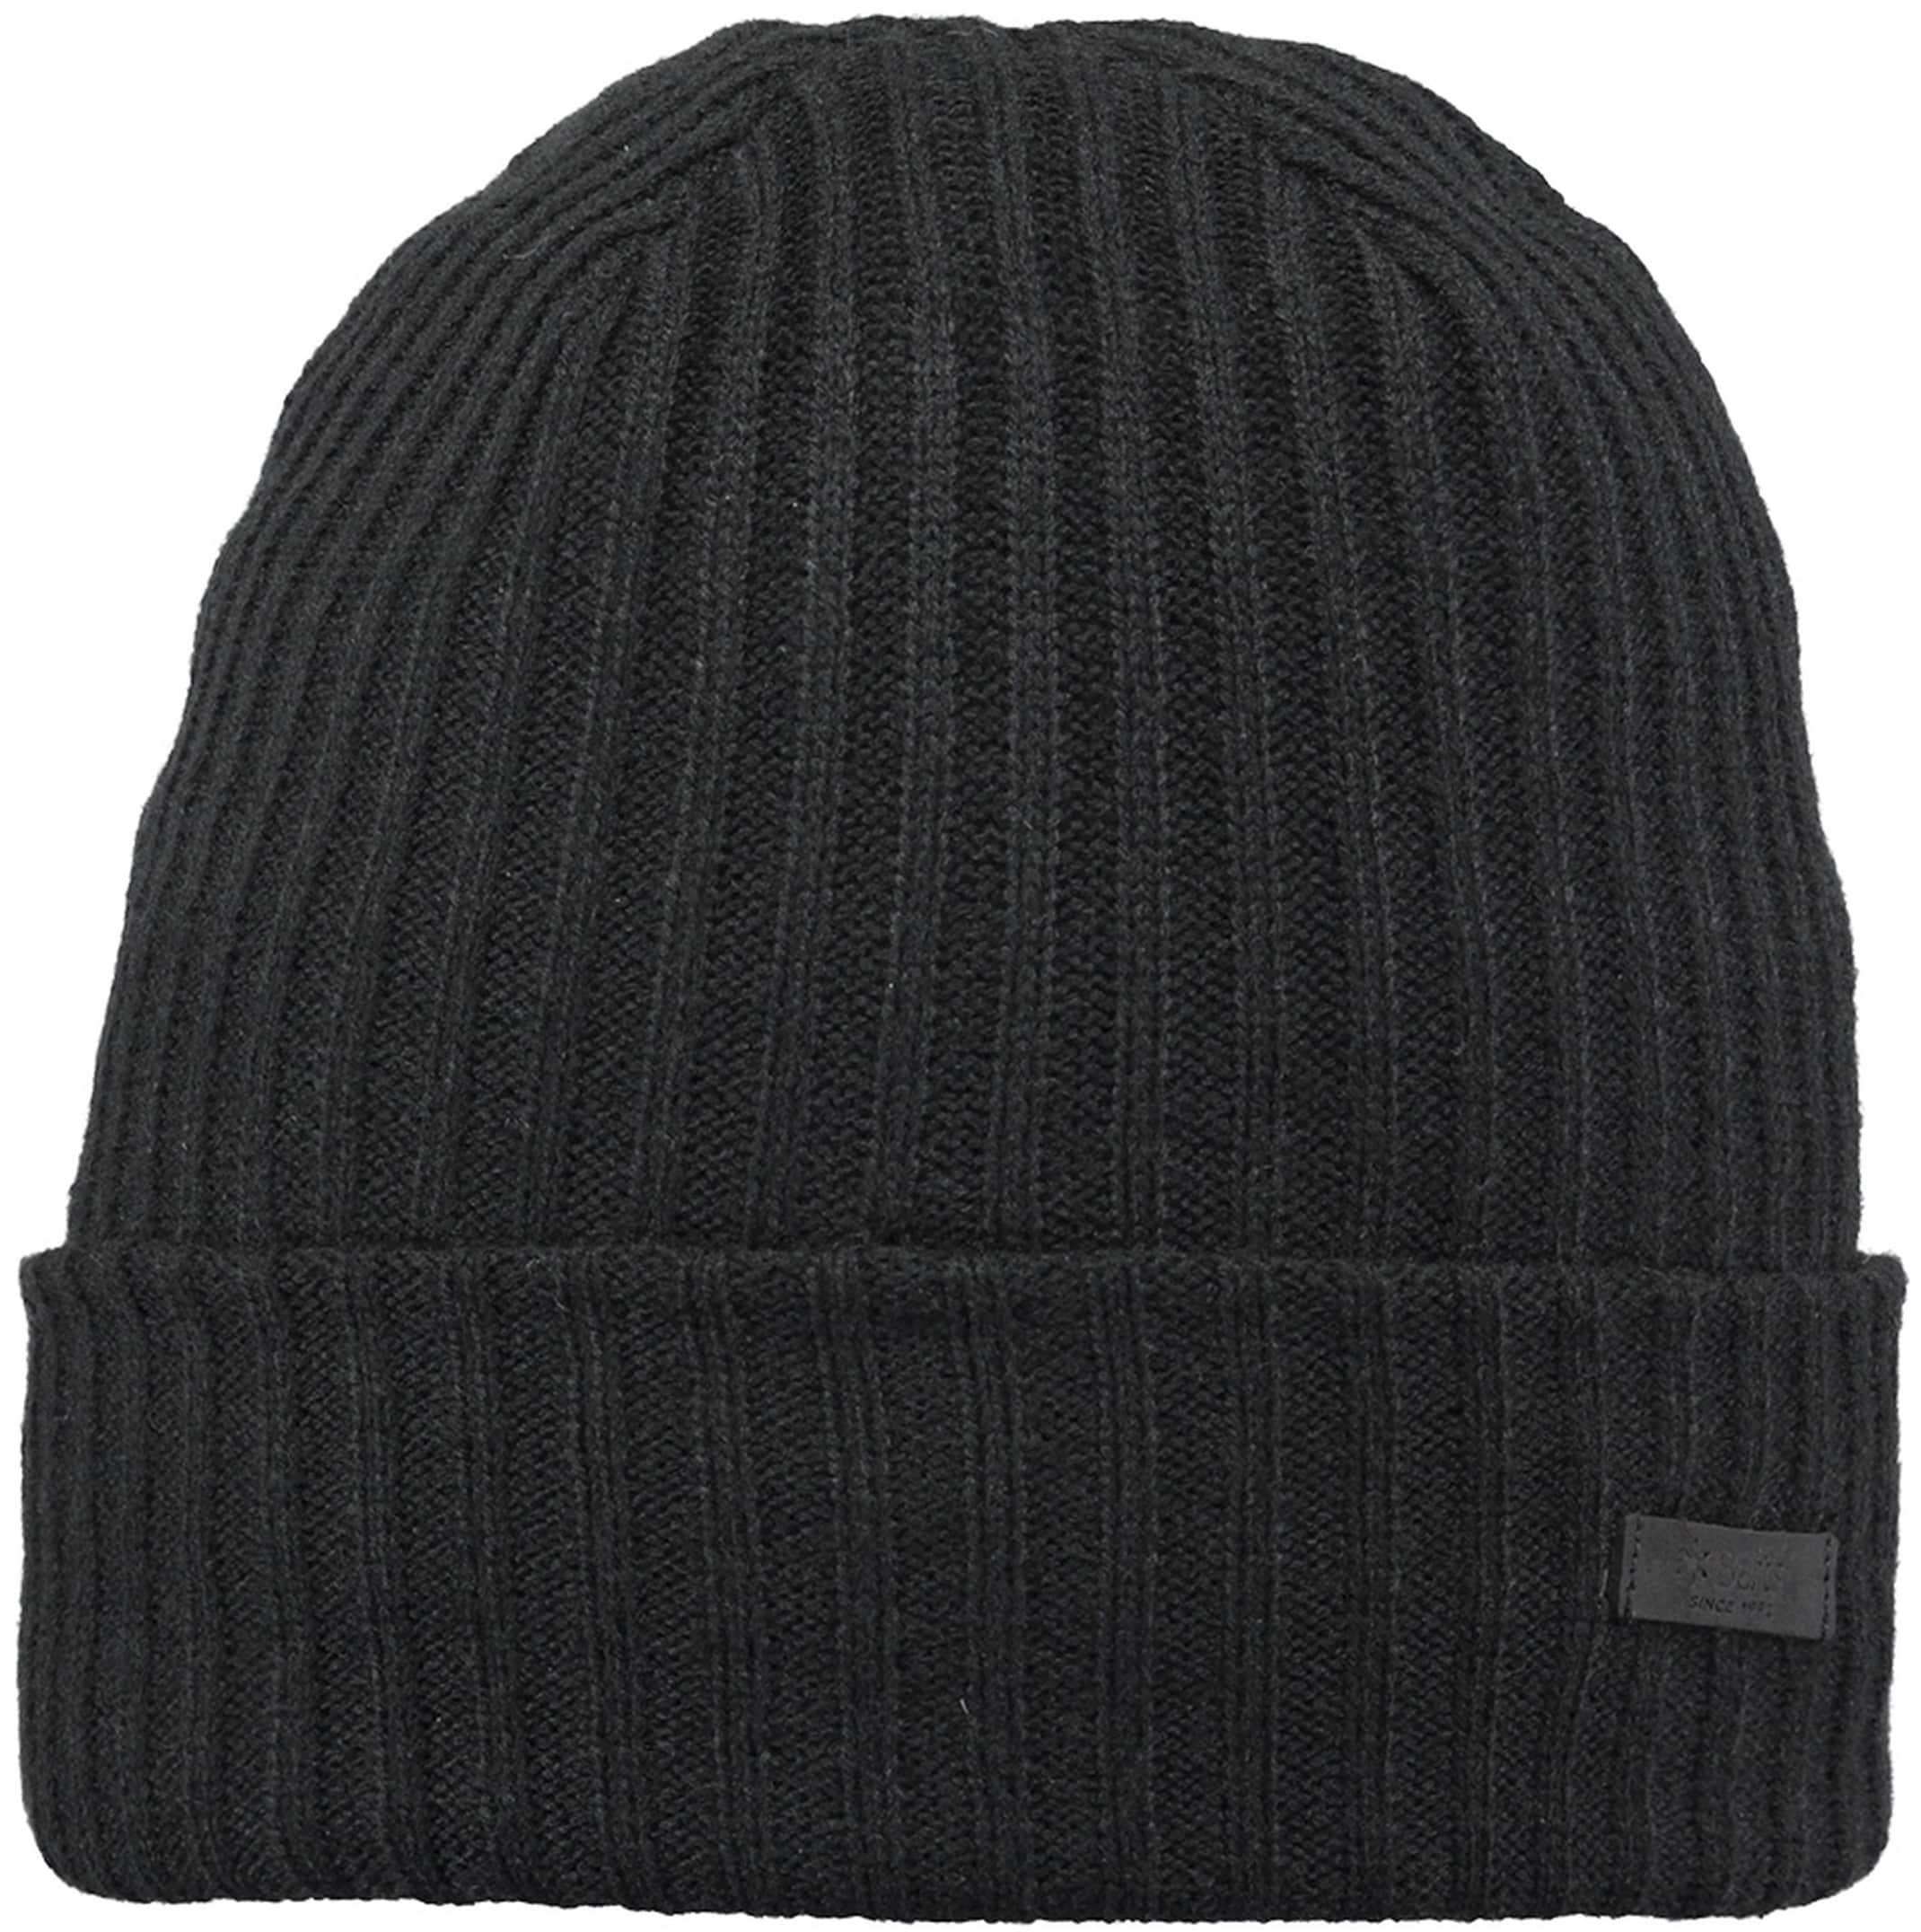 Barts Wilbert Turnup Beanie Black 3920 order online  01764892a1a8